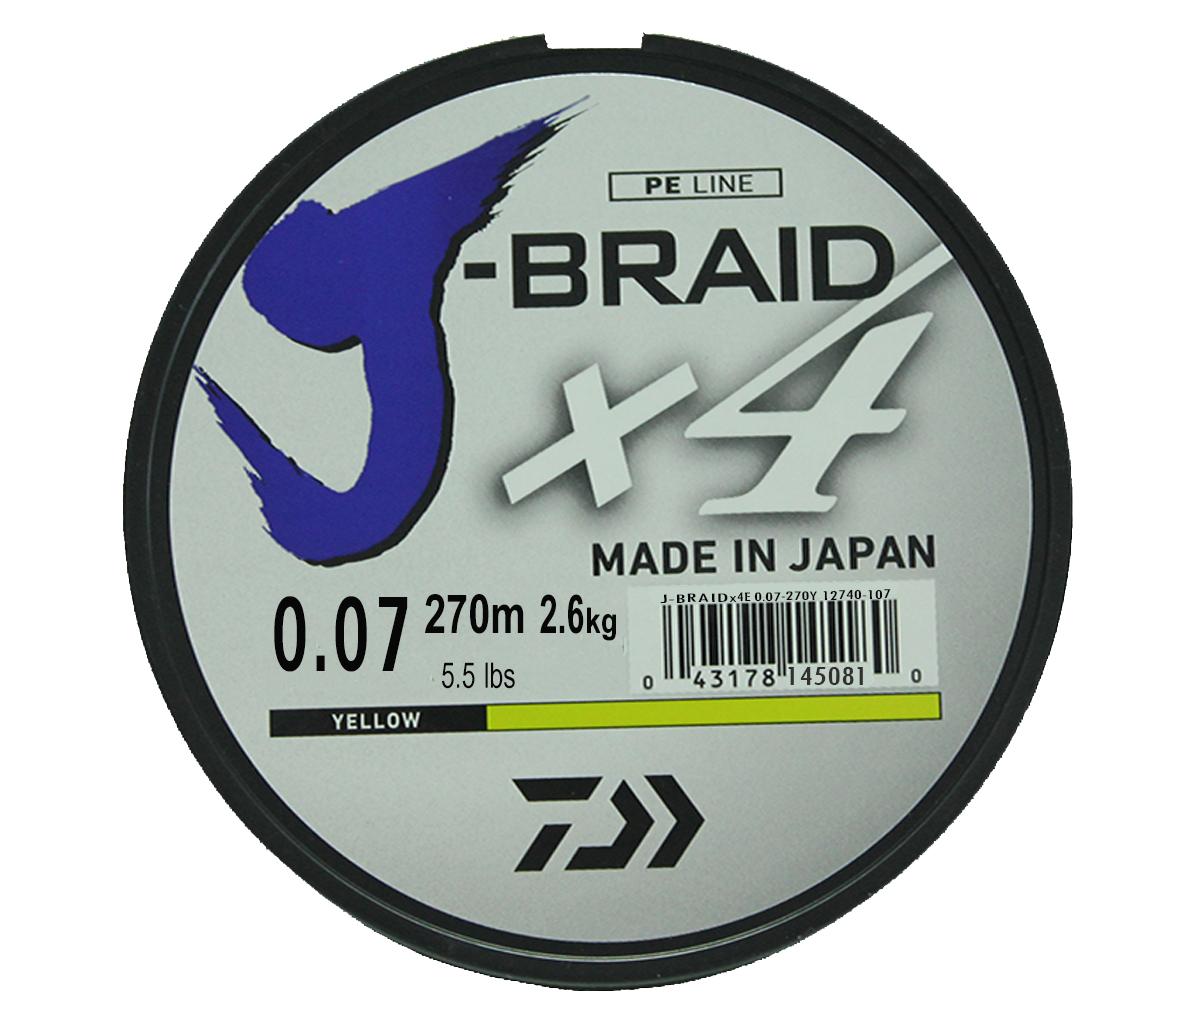 Шнур плетеный Daiwa J-Braid X4, цвет: флуоресцентный желтый, 270 м, 0,07 мм